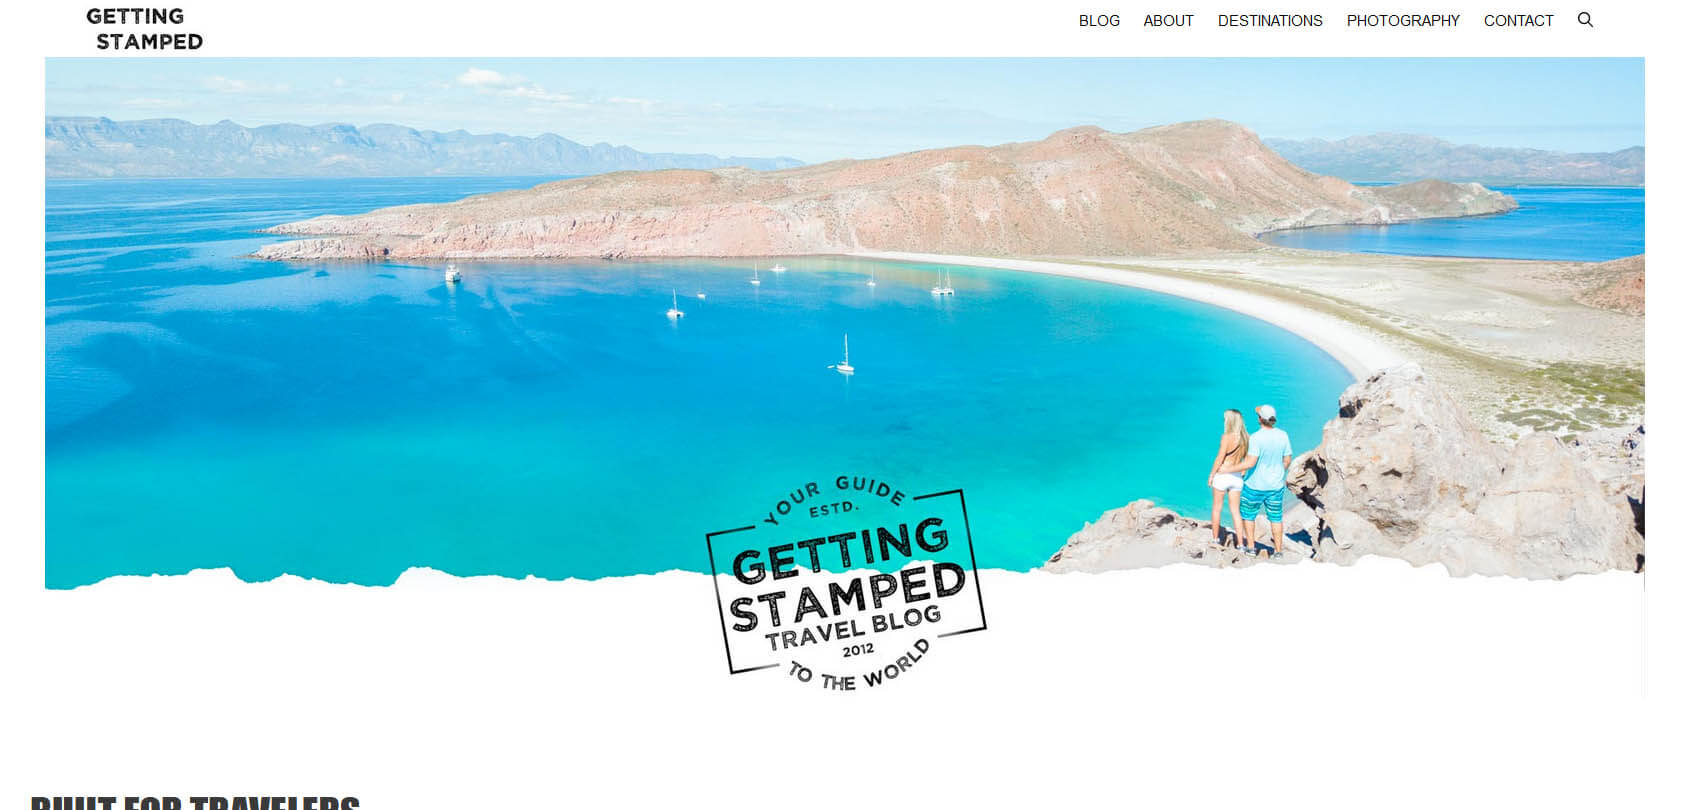 Getting Stamped Homepage